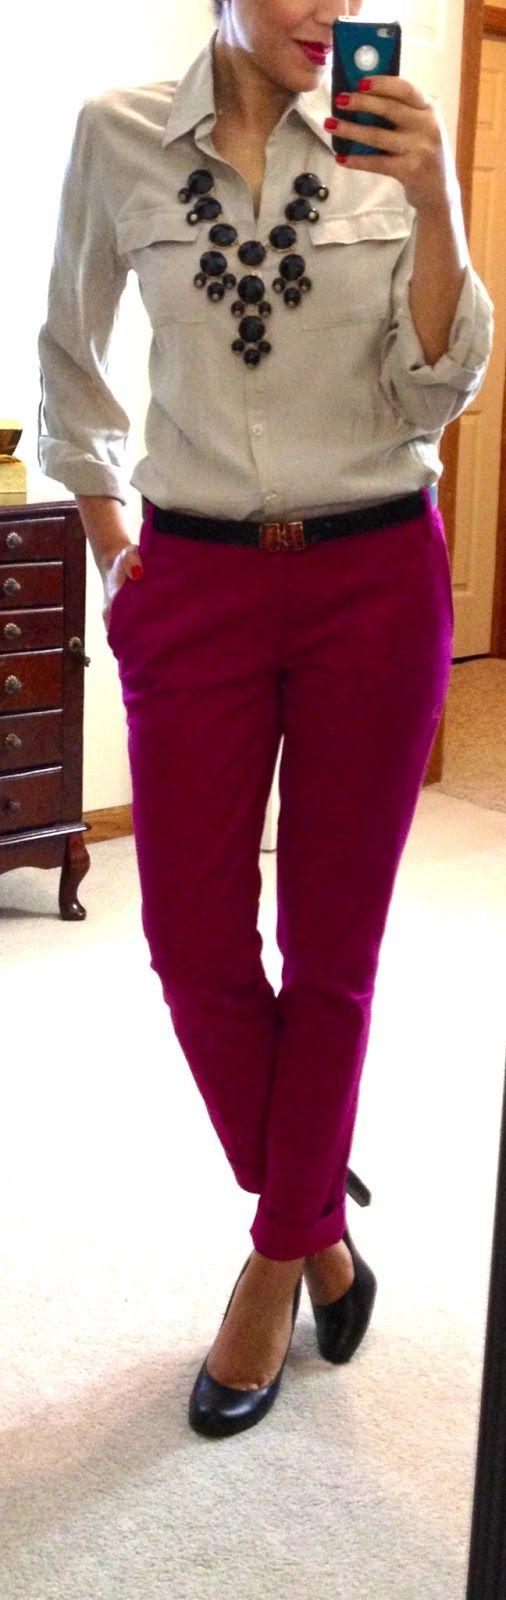 Blouse via TJMAXX (in cream), Target Mossimo Ankle Stretch Pant (in pink), belt via Francesca's, Jessica Simpson pumps, bubble necklace via eBay